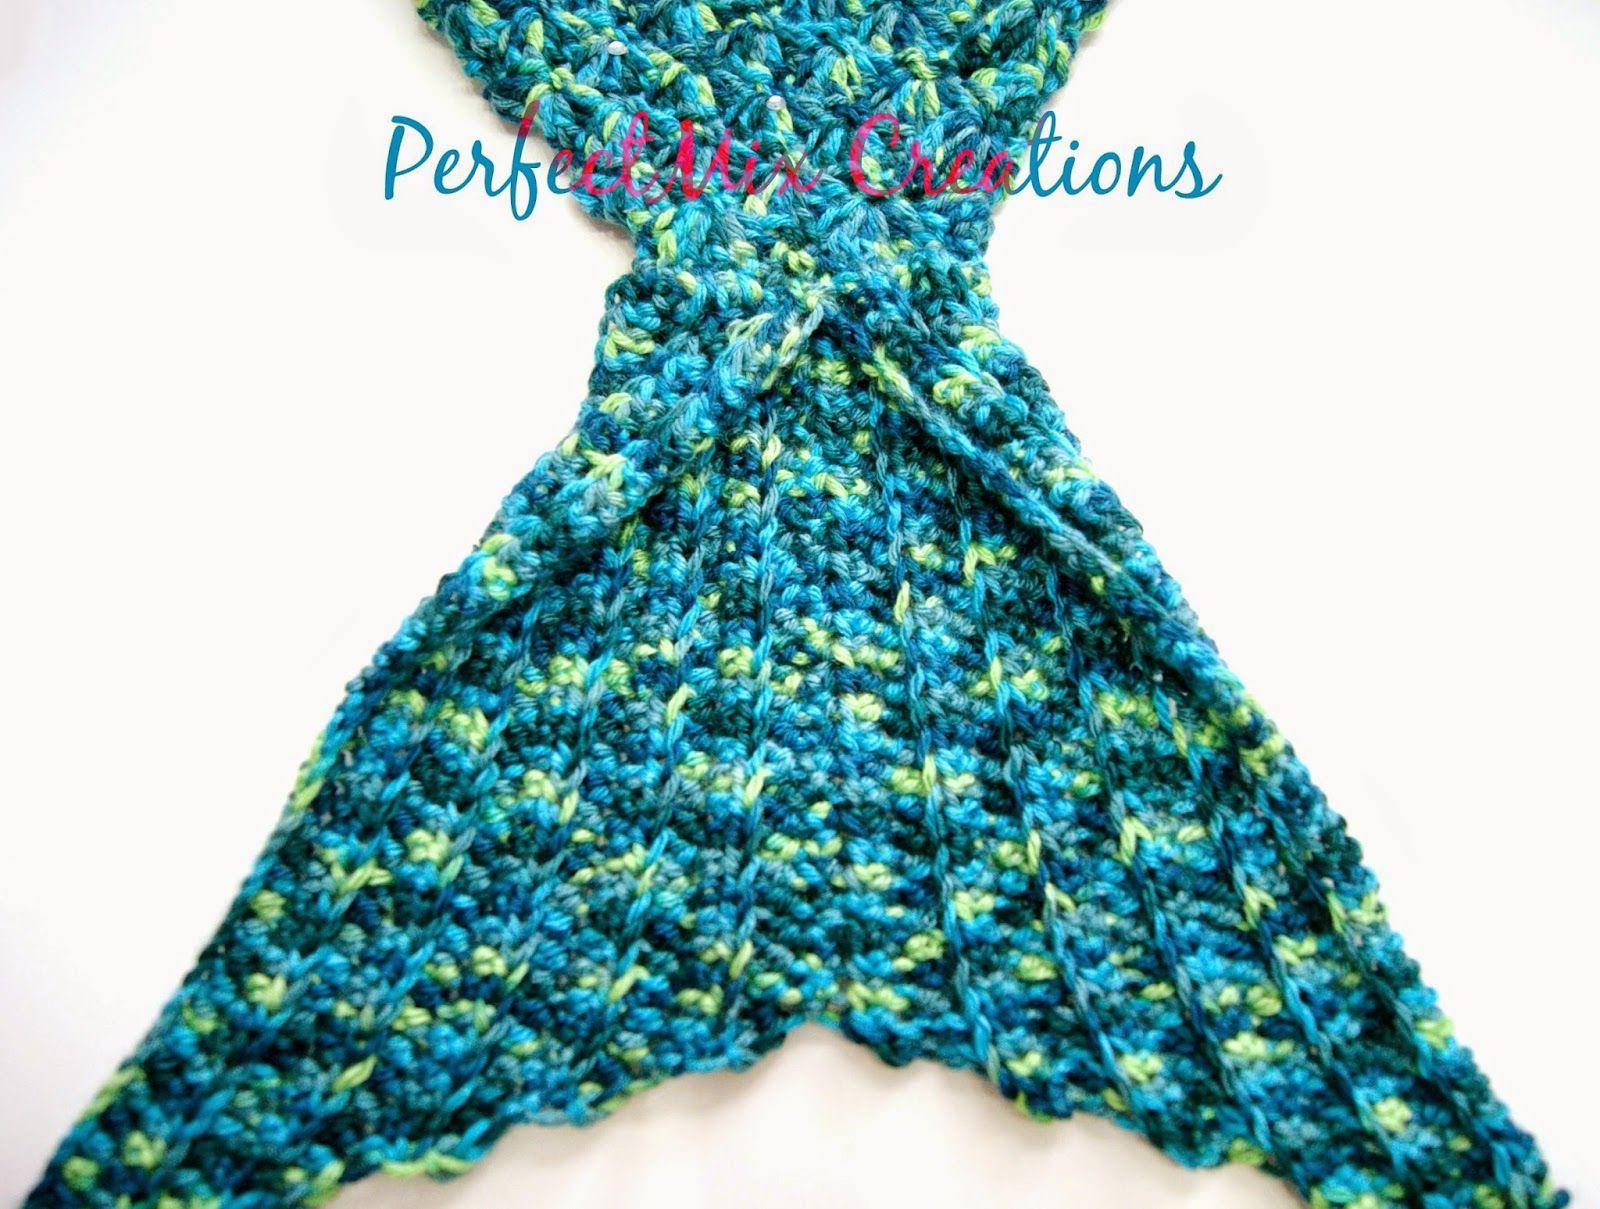 Crochet Mermaid Tail Fin Pattern Calda de sereia em croche pap ...